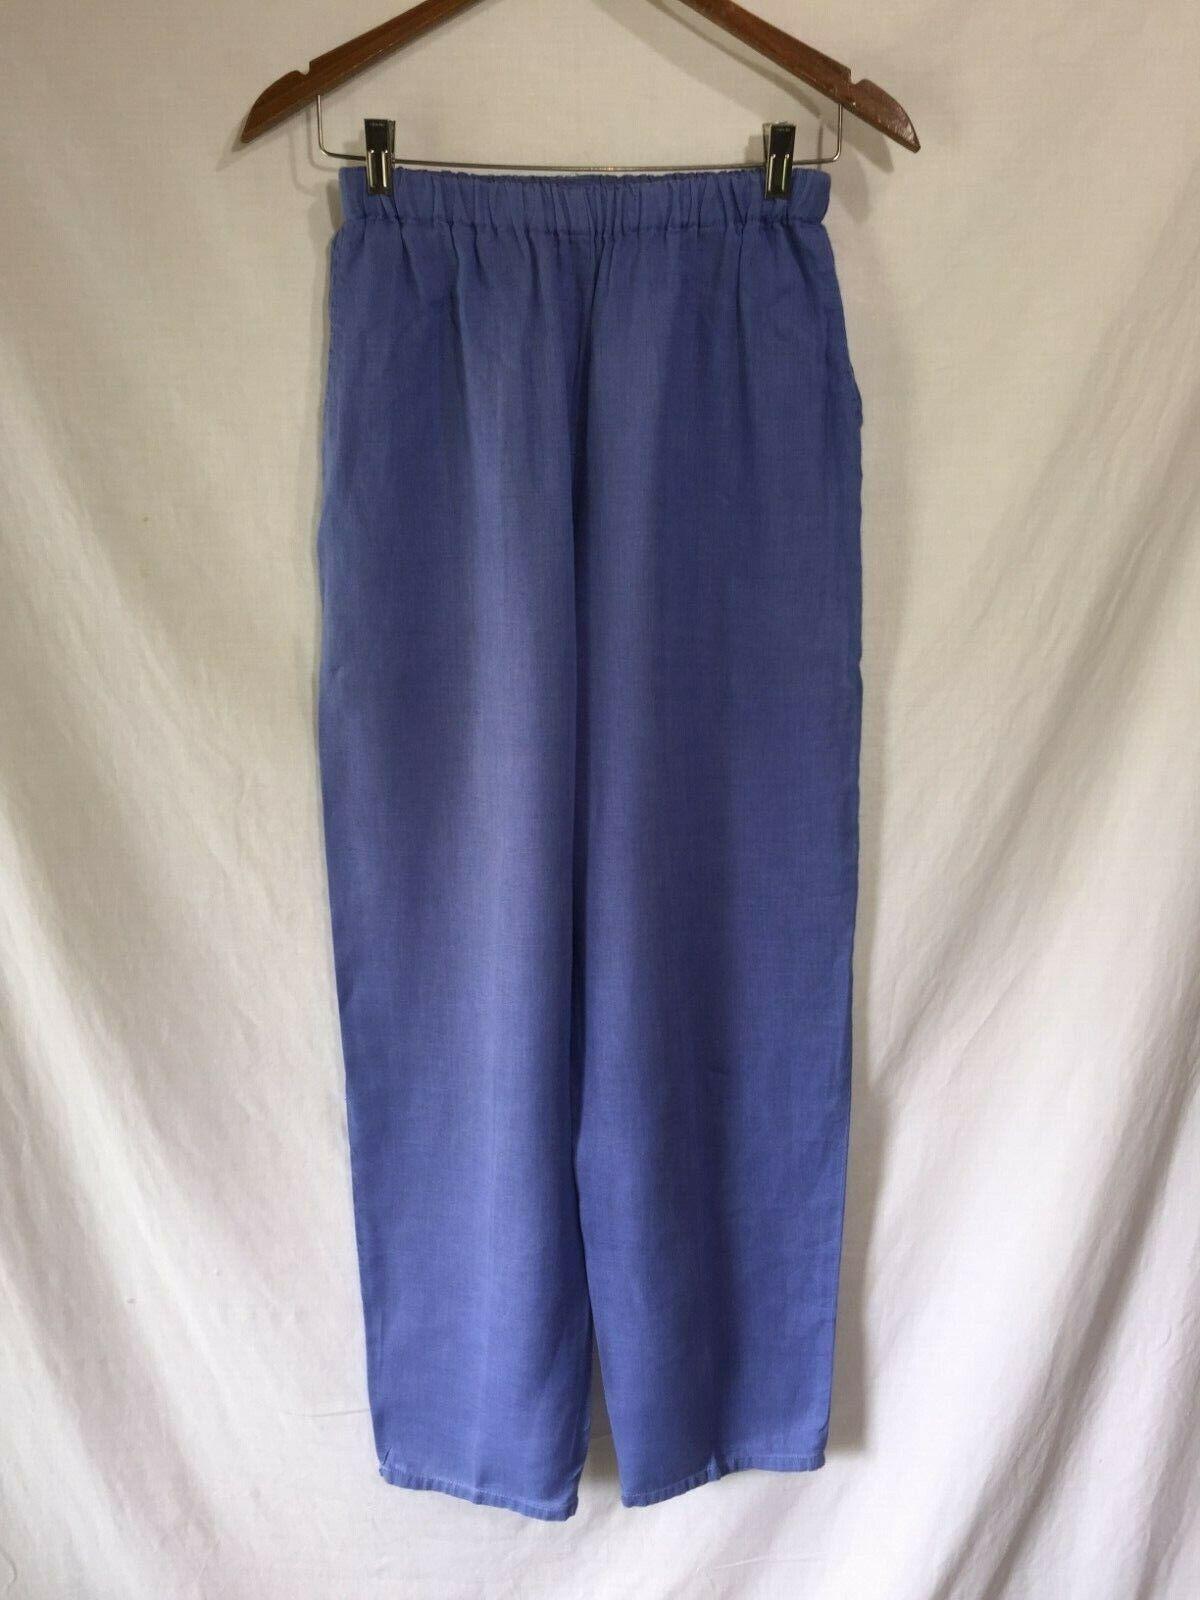 FLAX by Jeanne Engelhart Long Taperot Bright Blau Linen Beach Pants S